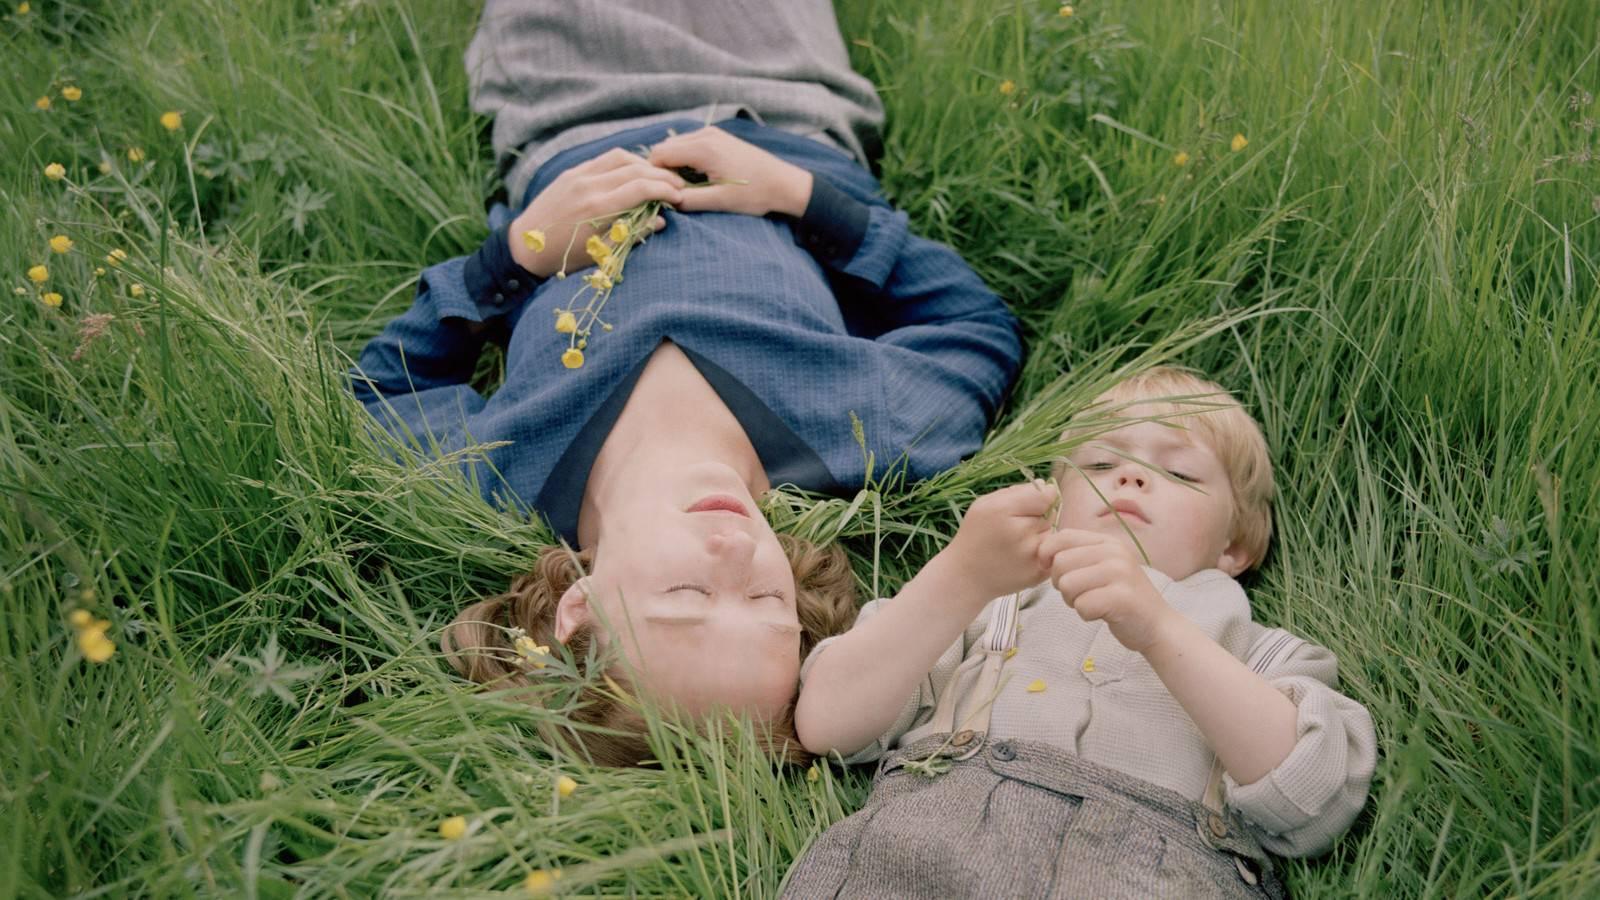 Movie, Unga Astrid(瑞典, 2018年) / 當幸福提早來(台灣) / Becoming Astrid(英文) / 关于阿斯特丽德(網路), 片尾劇情